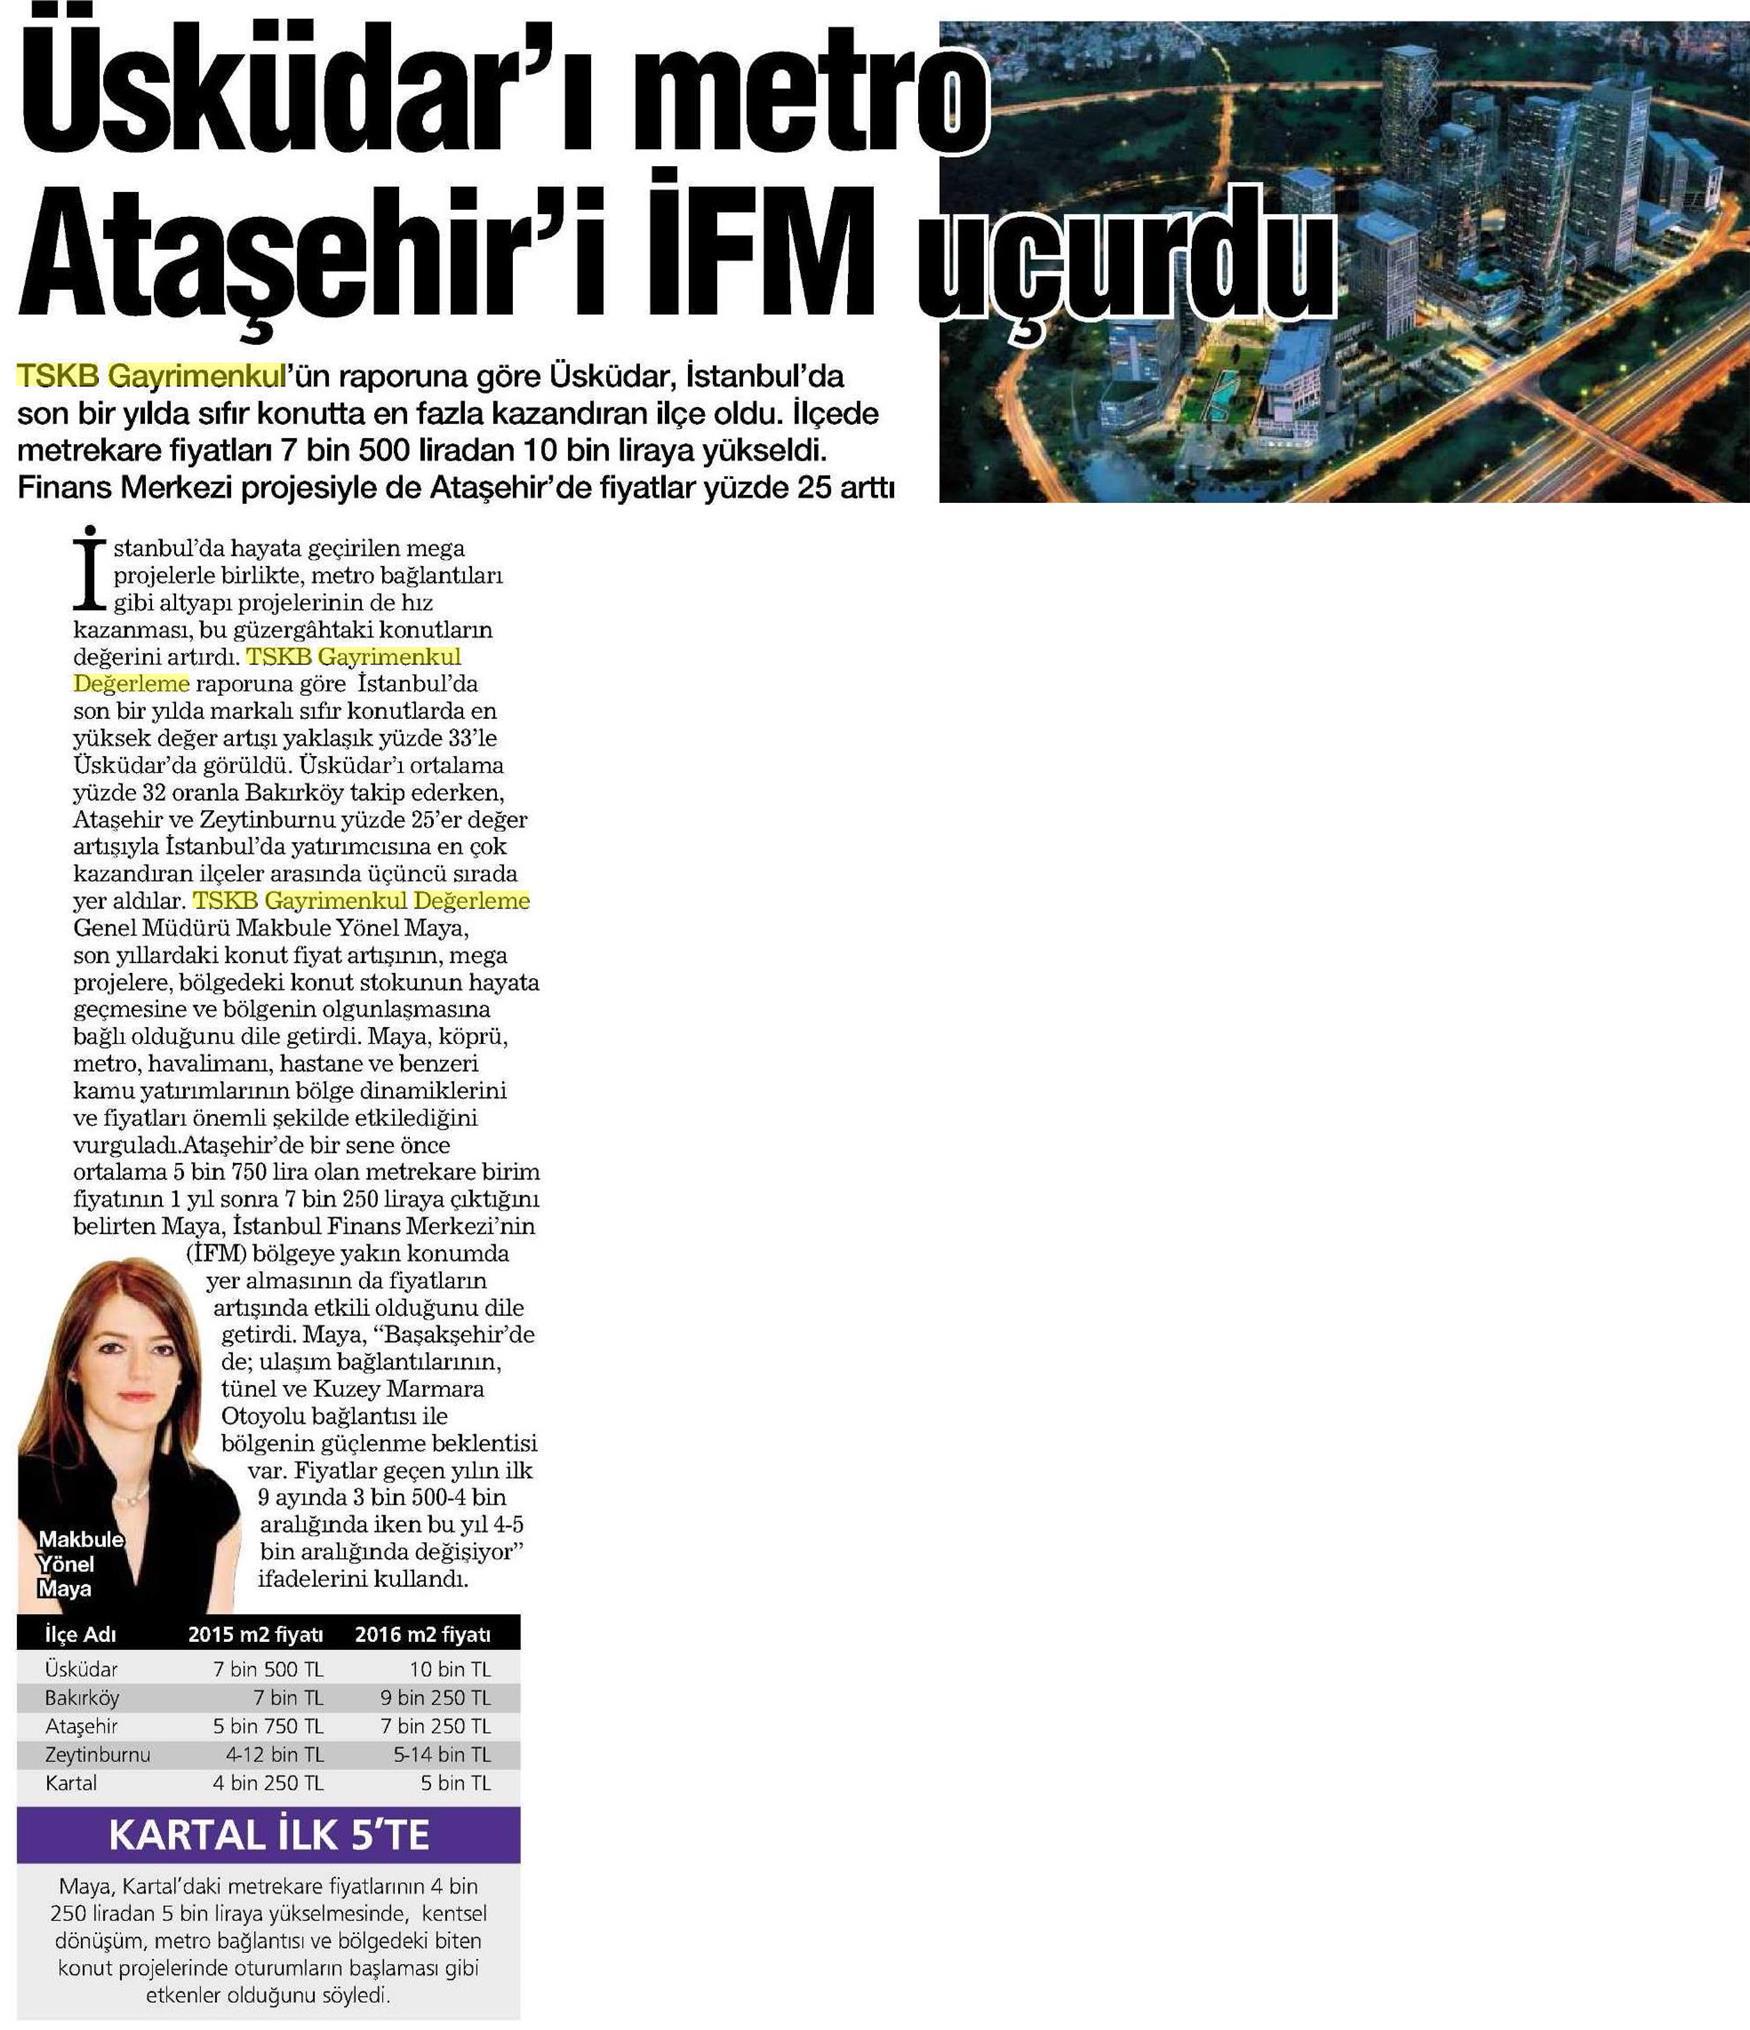 10_18 10 tskbgd @ haberturk 11